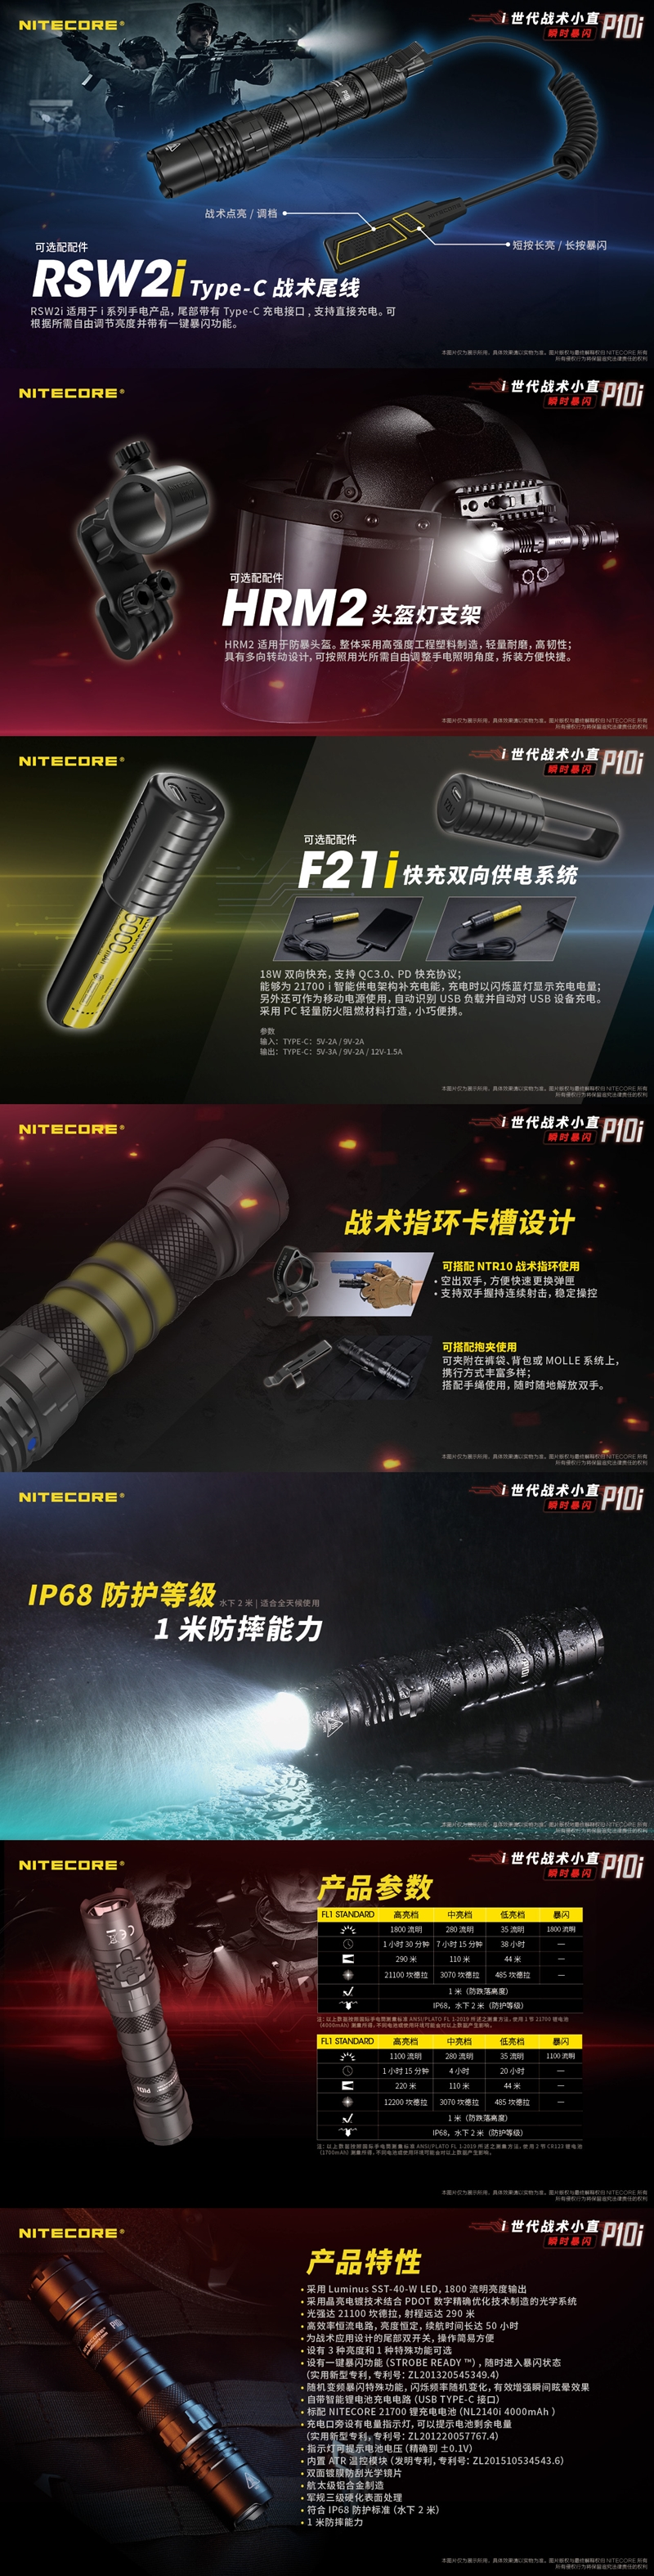 5-NITECORE I4000R 4400流明 附原廠電池 USB充電 MOLLE快拆套 NTR10 戰術指環 (3)